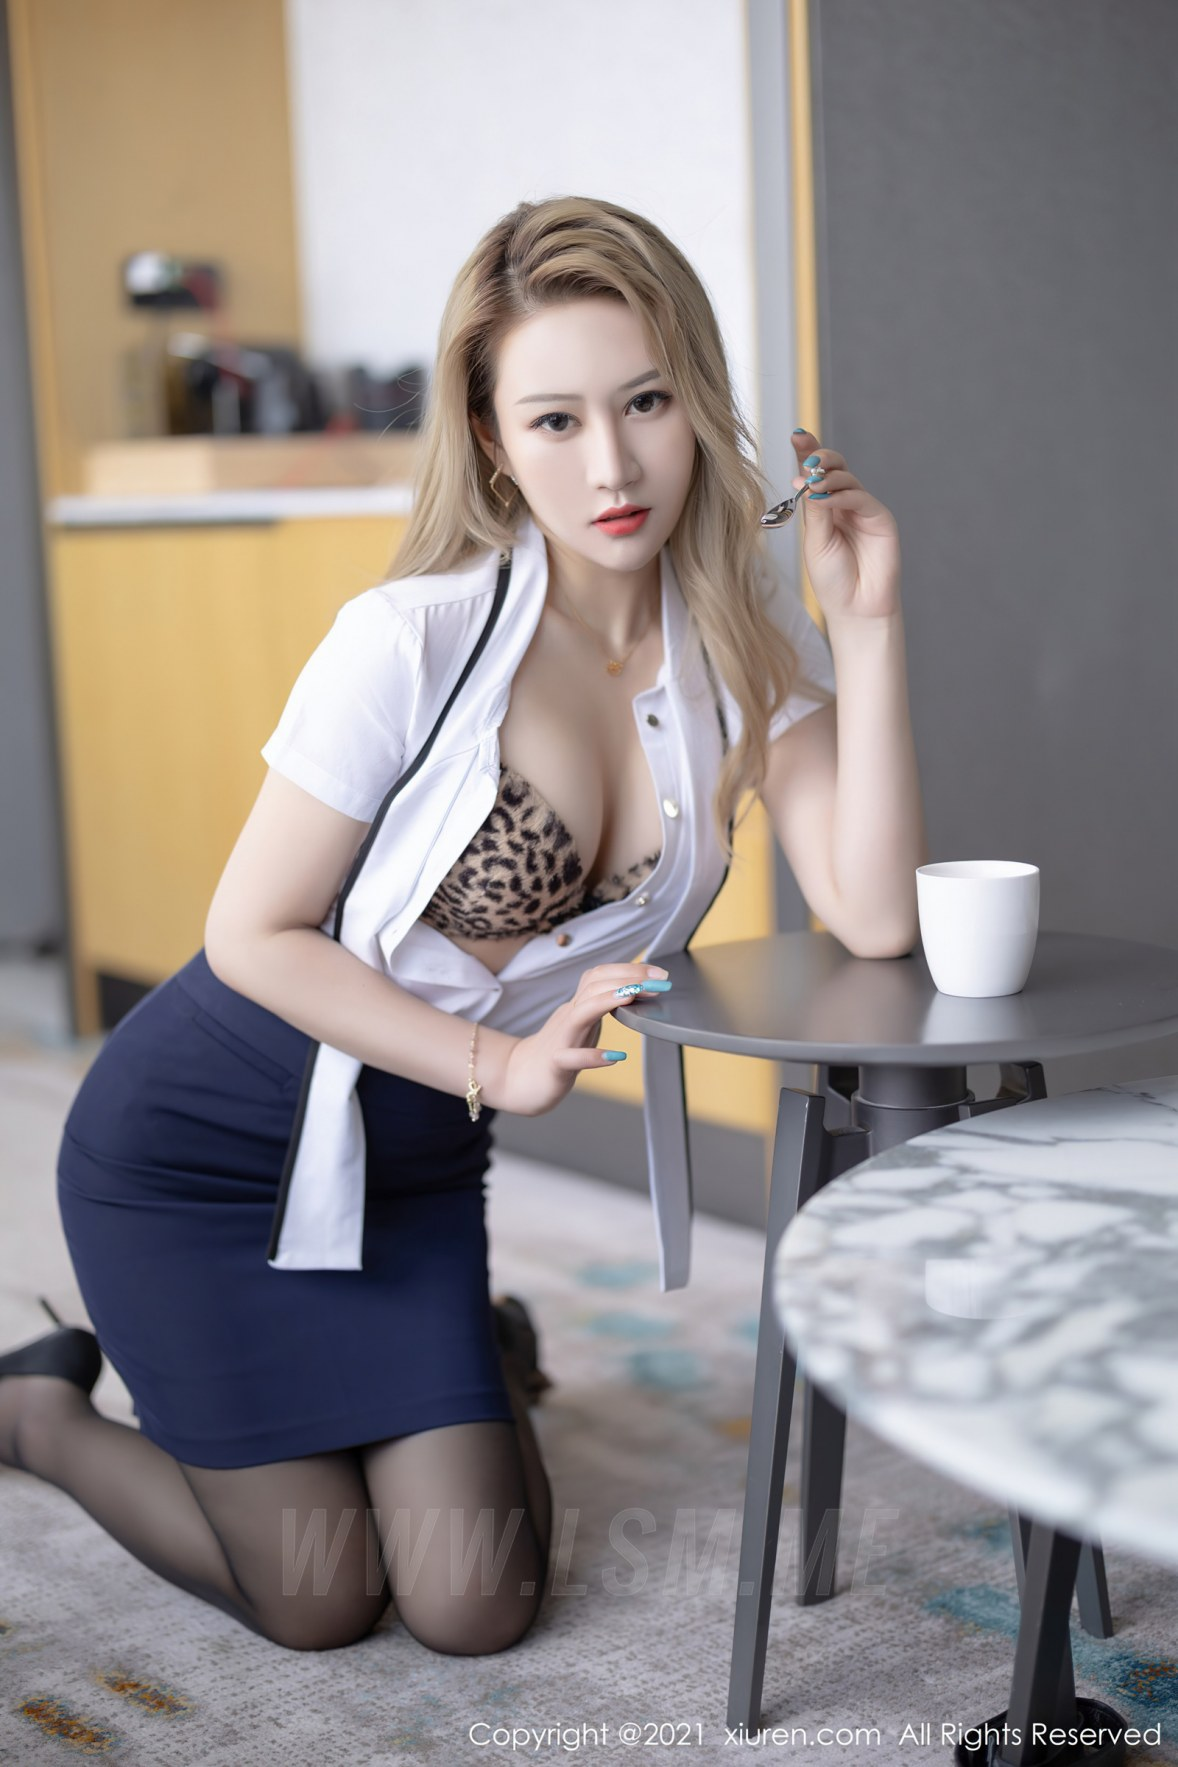 3511 020 qai 3600 5400 - XiuRen 秀人 No.3511  白衬衫黑丝 张欣欣 性感写真 - 秀人网 -【免费在线写真】【丽人丝语】